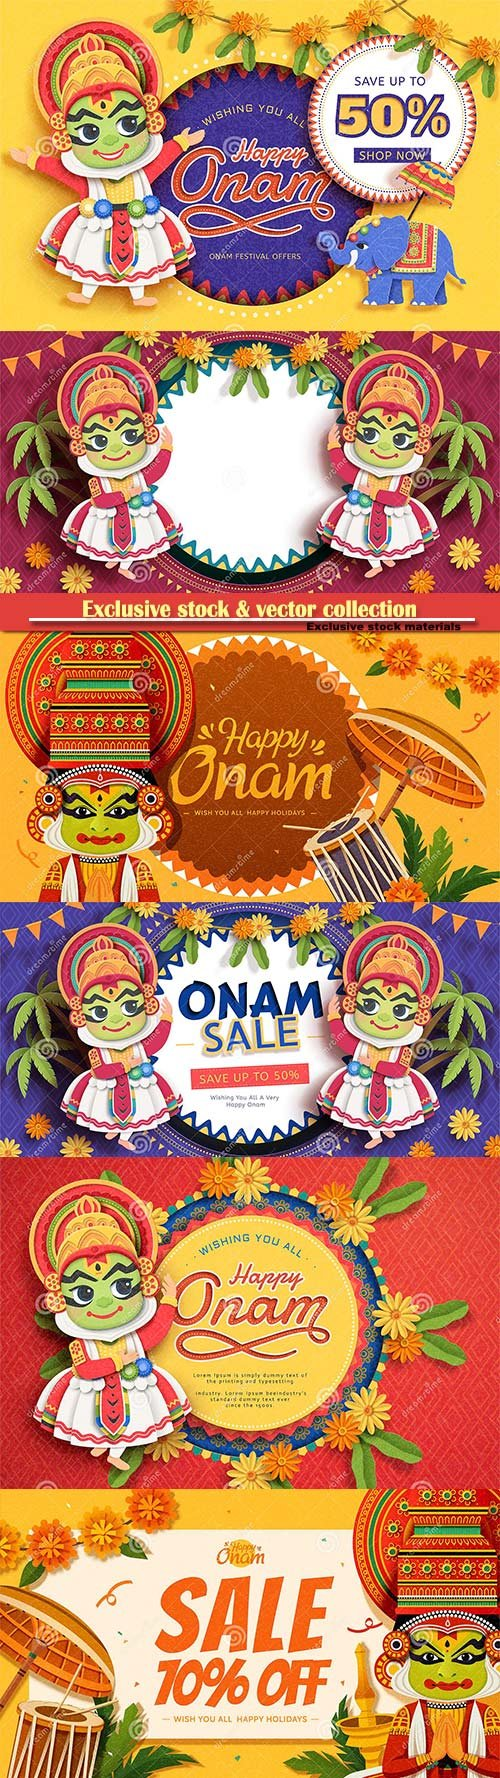 Happy Onam festival sale design with cute Kathakali dancer